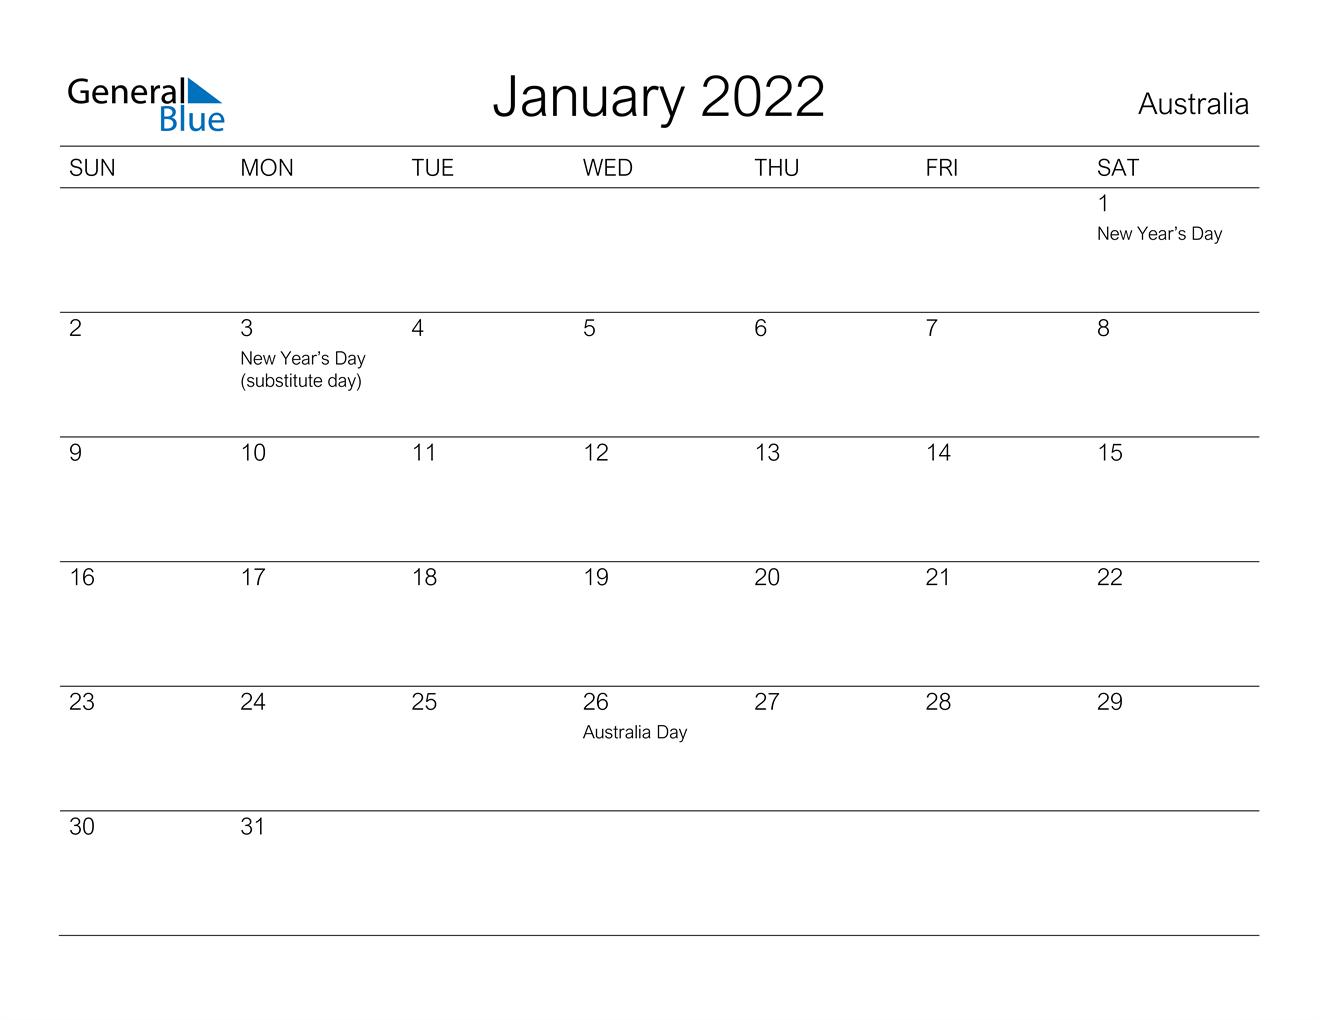 January 2022 Calendar - Australia